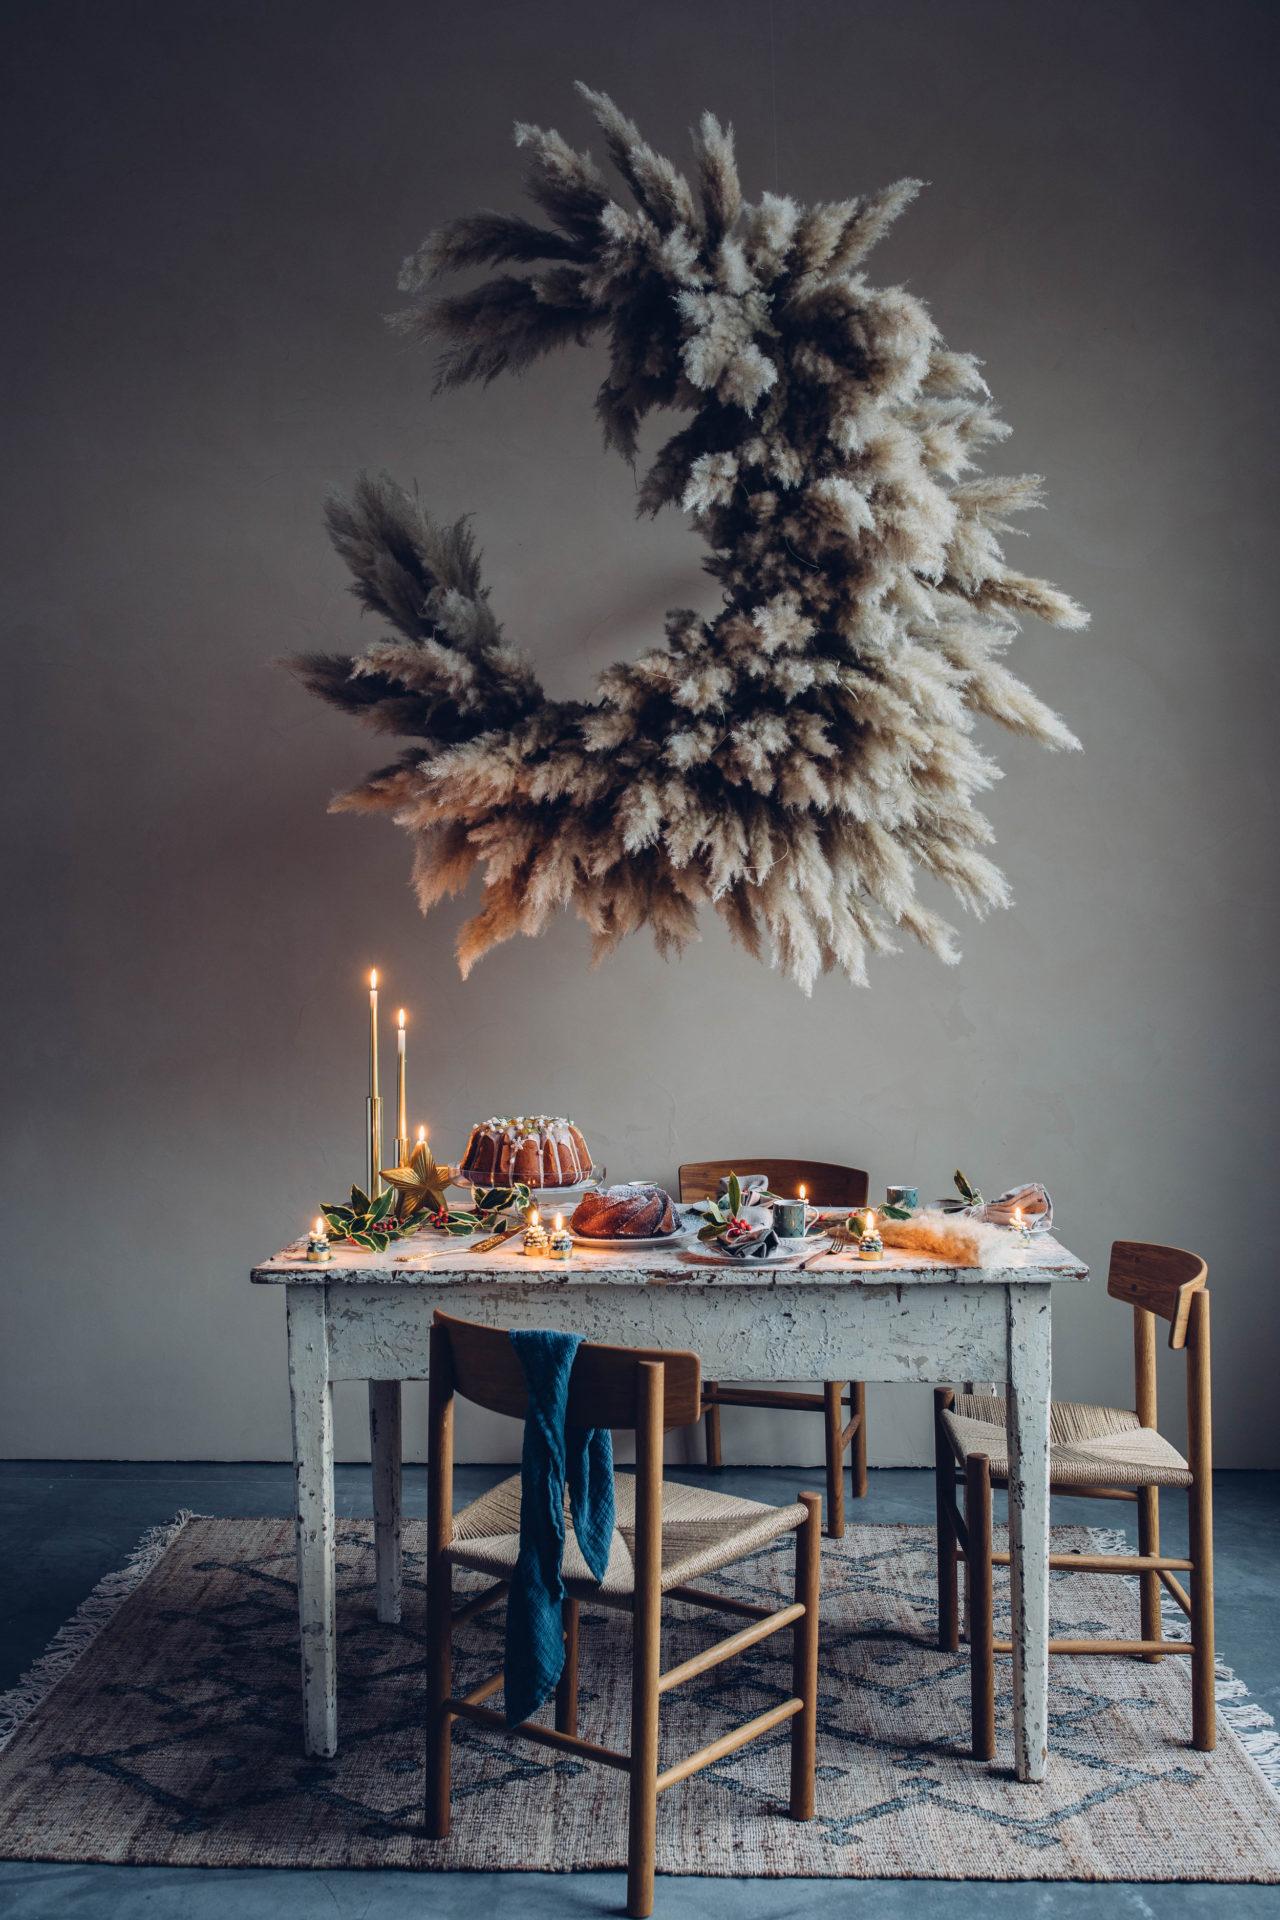 http://www.trendymood.com/wp-content/uploads/2019/01/Mary-Lennox-Floral-Designer-PampasMoon06-1280x1920.jpg